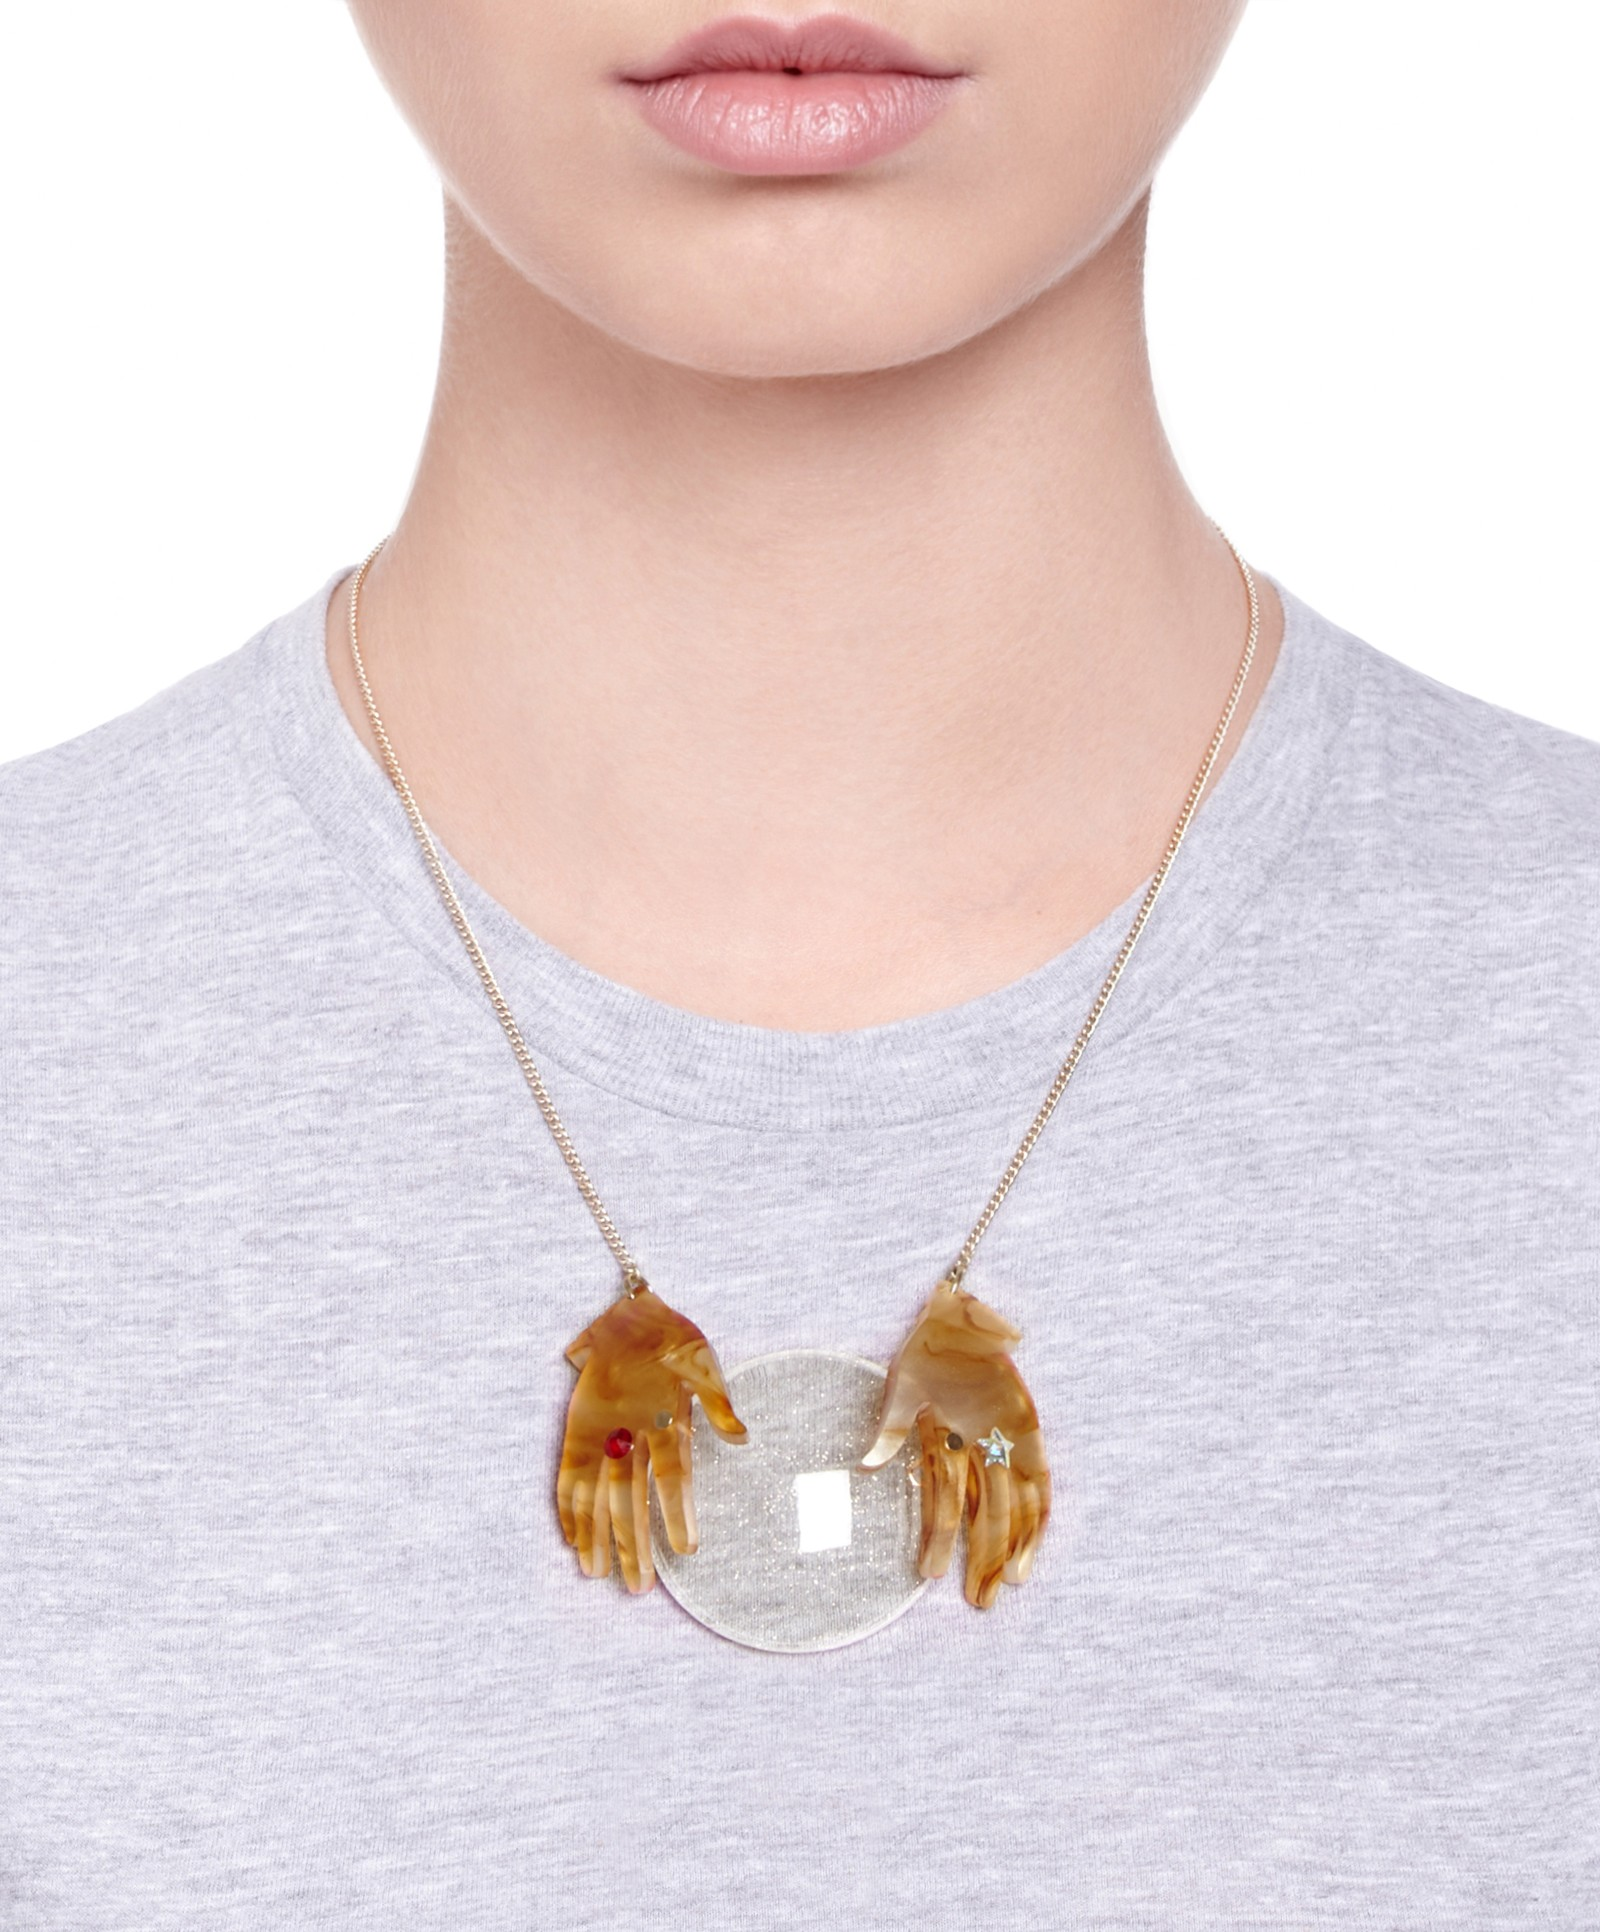 fortune_teller_hands_necklace_03.jpg